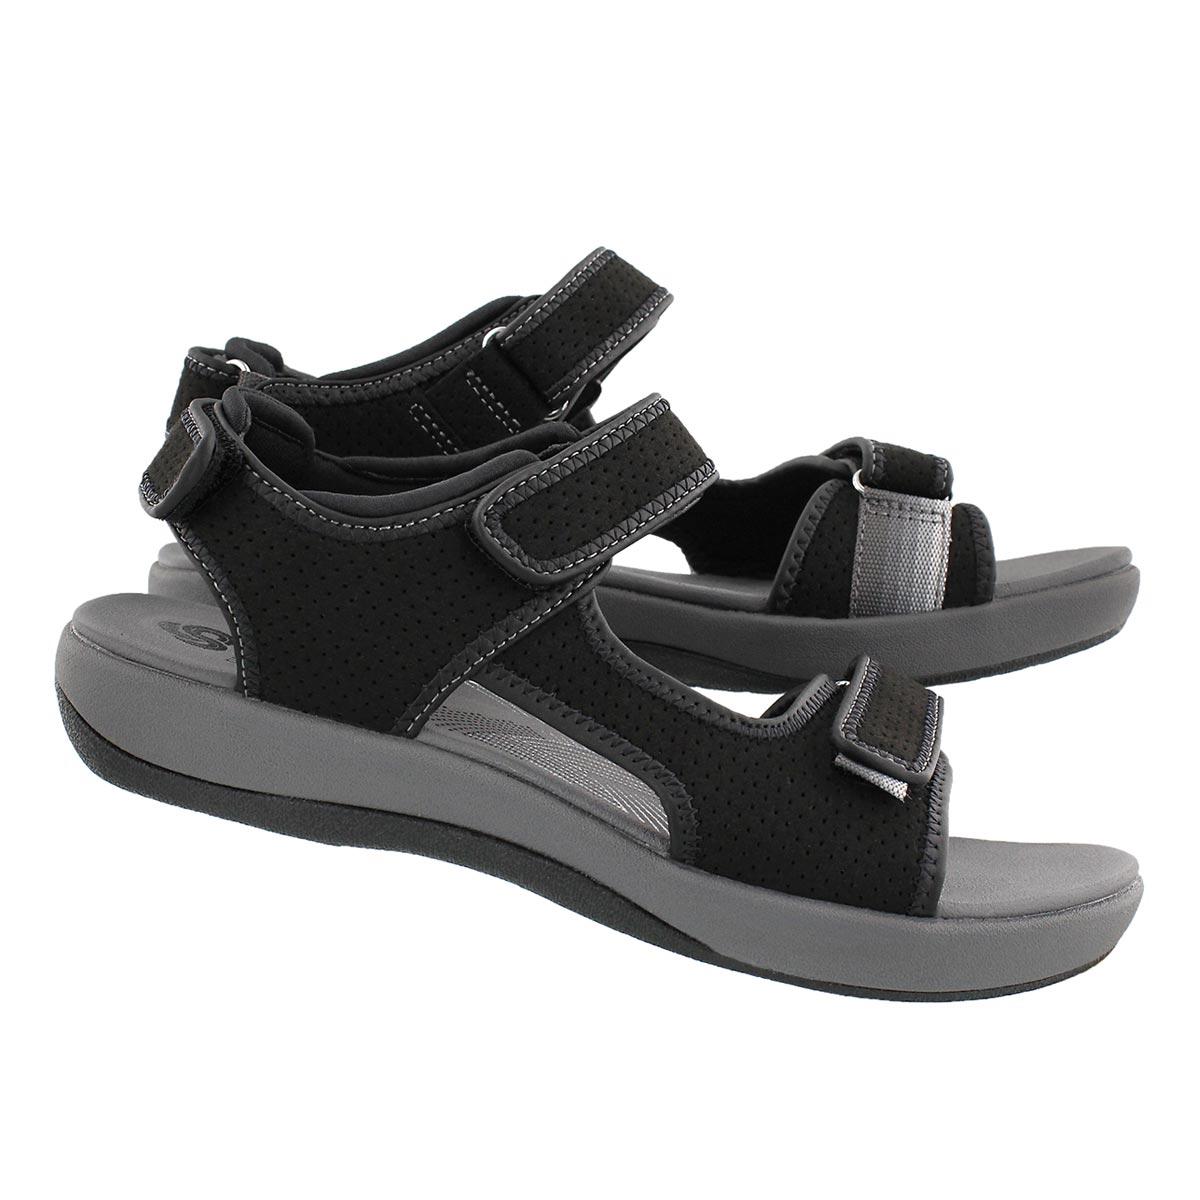 Lds Brizo Sammie black casual sandal